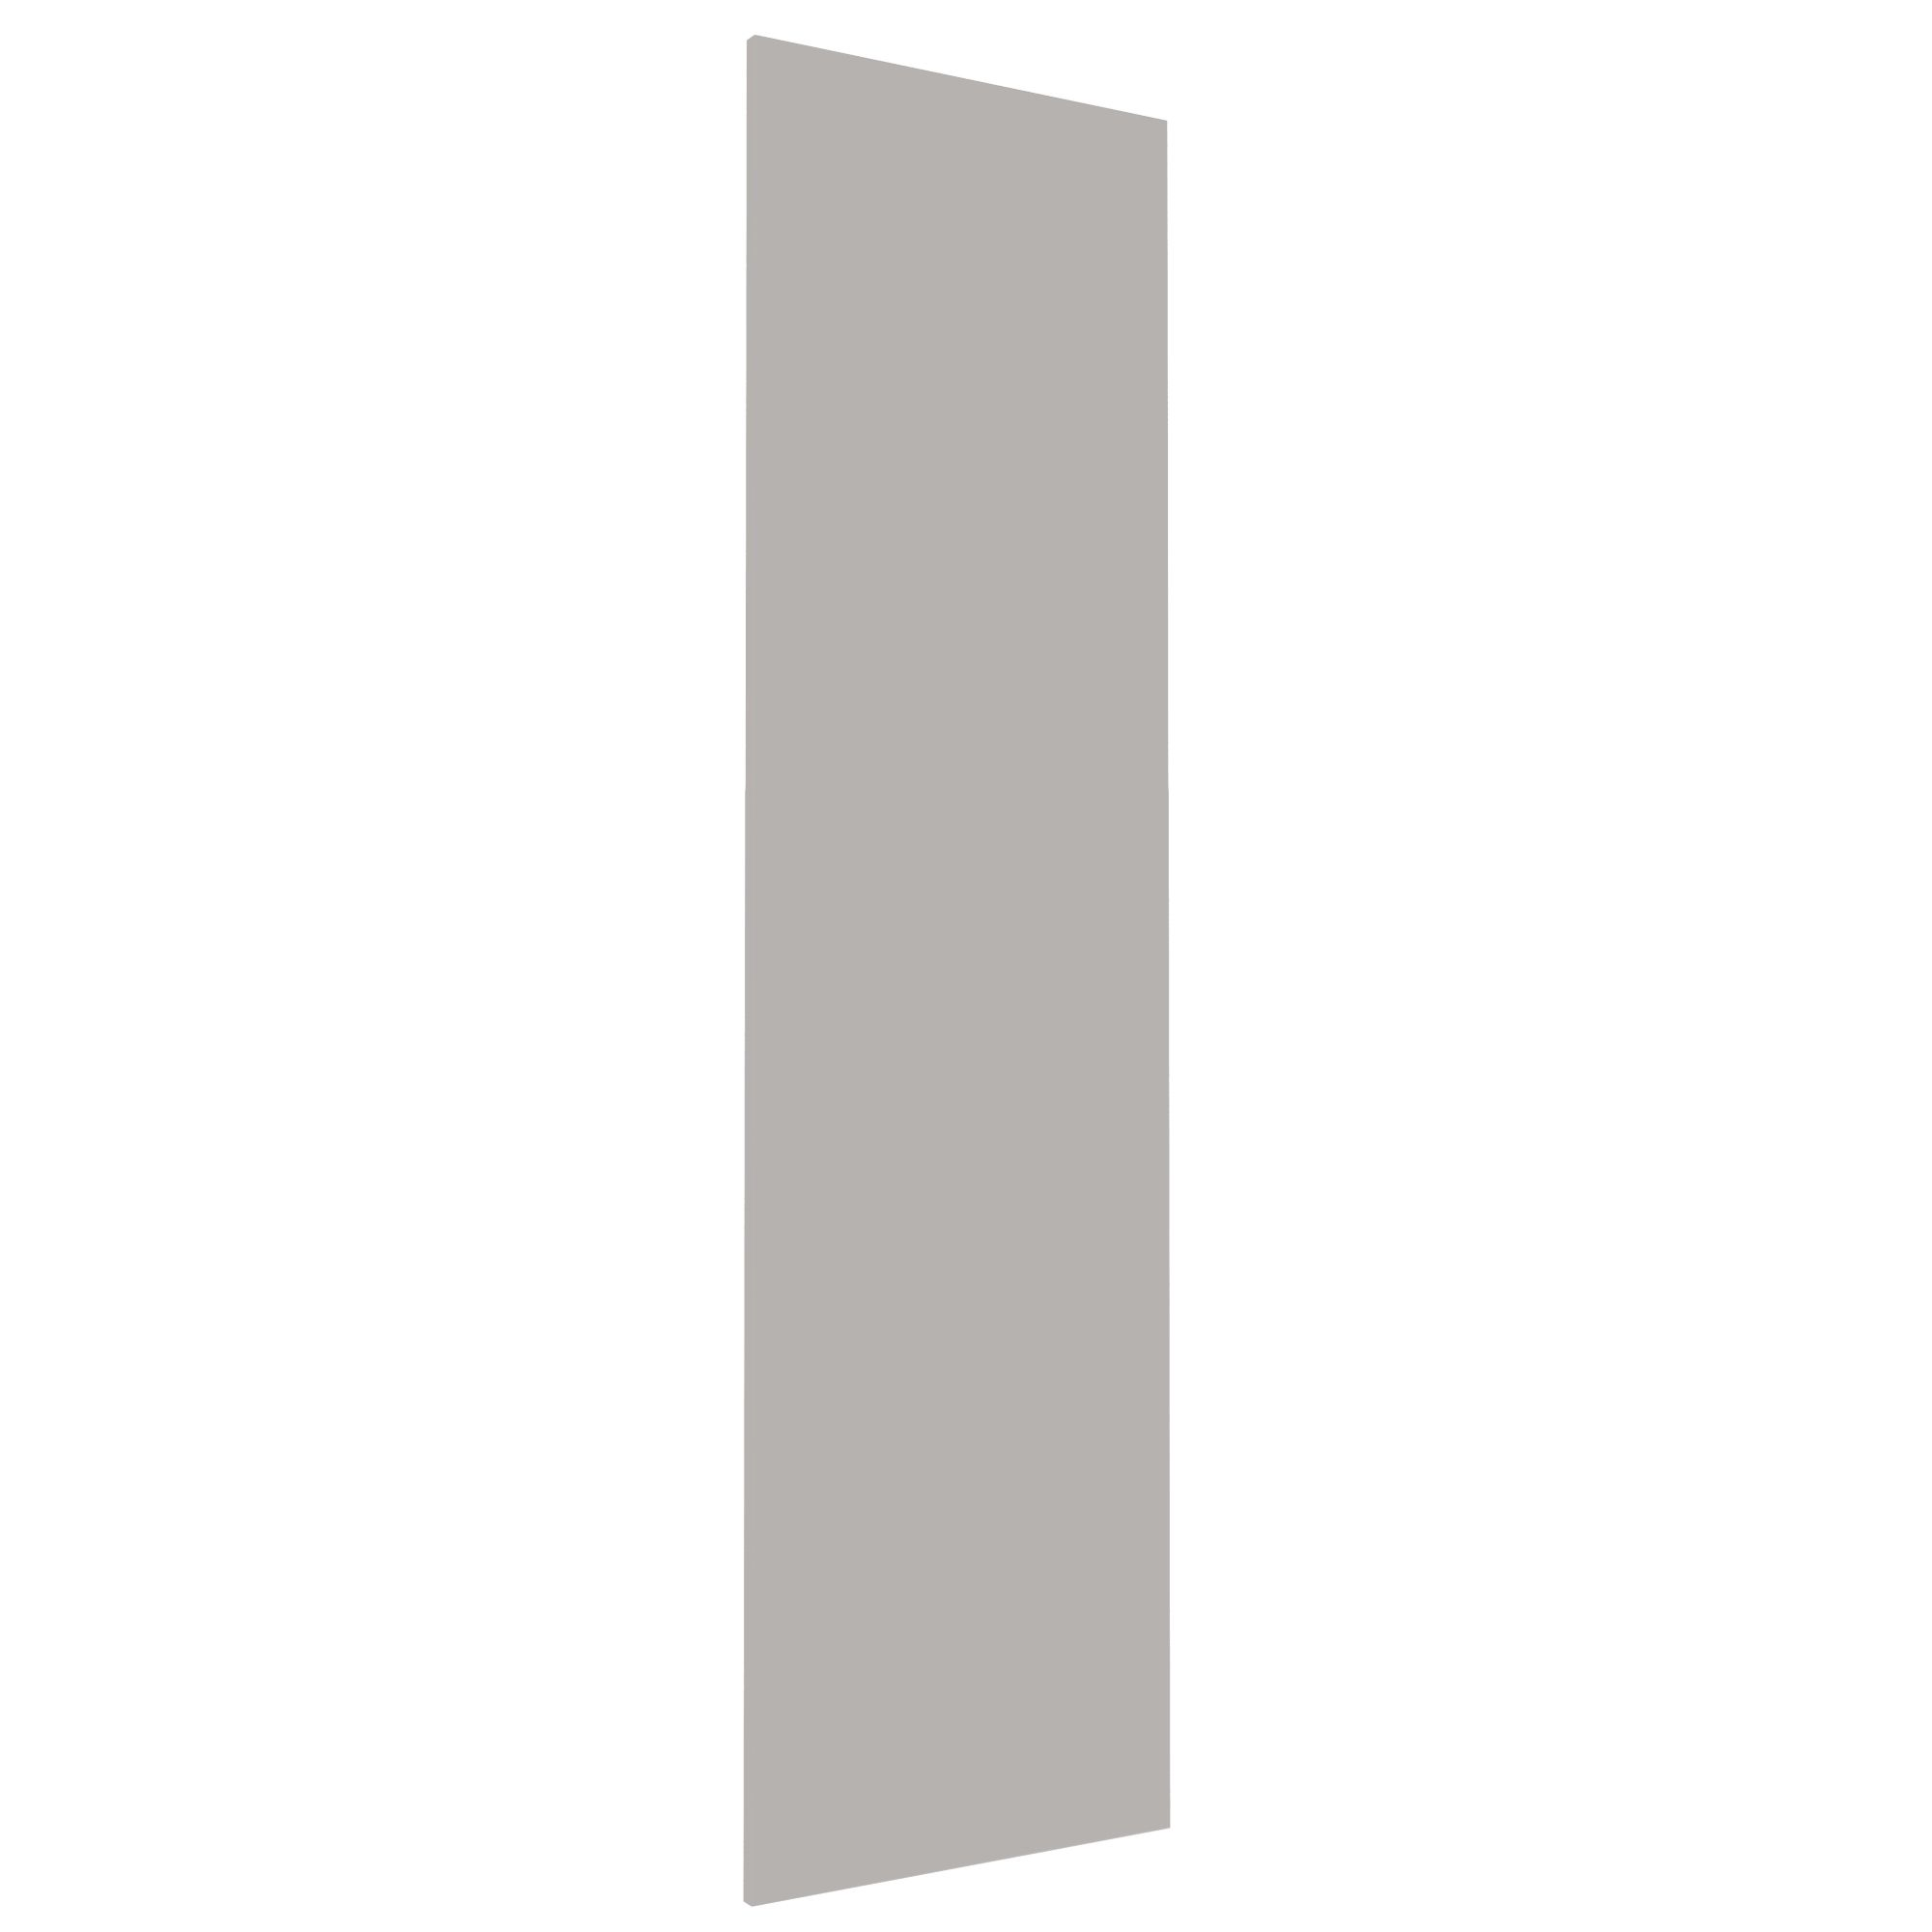 Darwin Modular Grey & Matt Wardrobe Door (h)1936mm (w)497mm (d)16mm